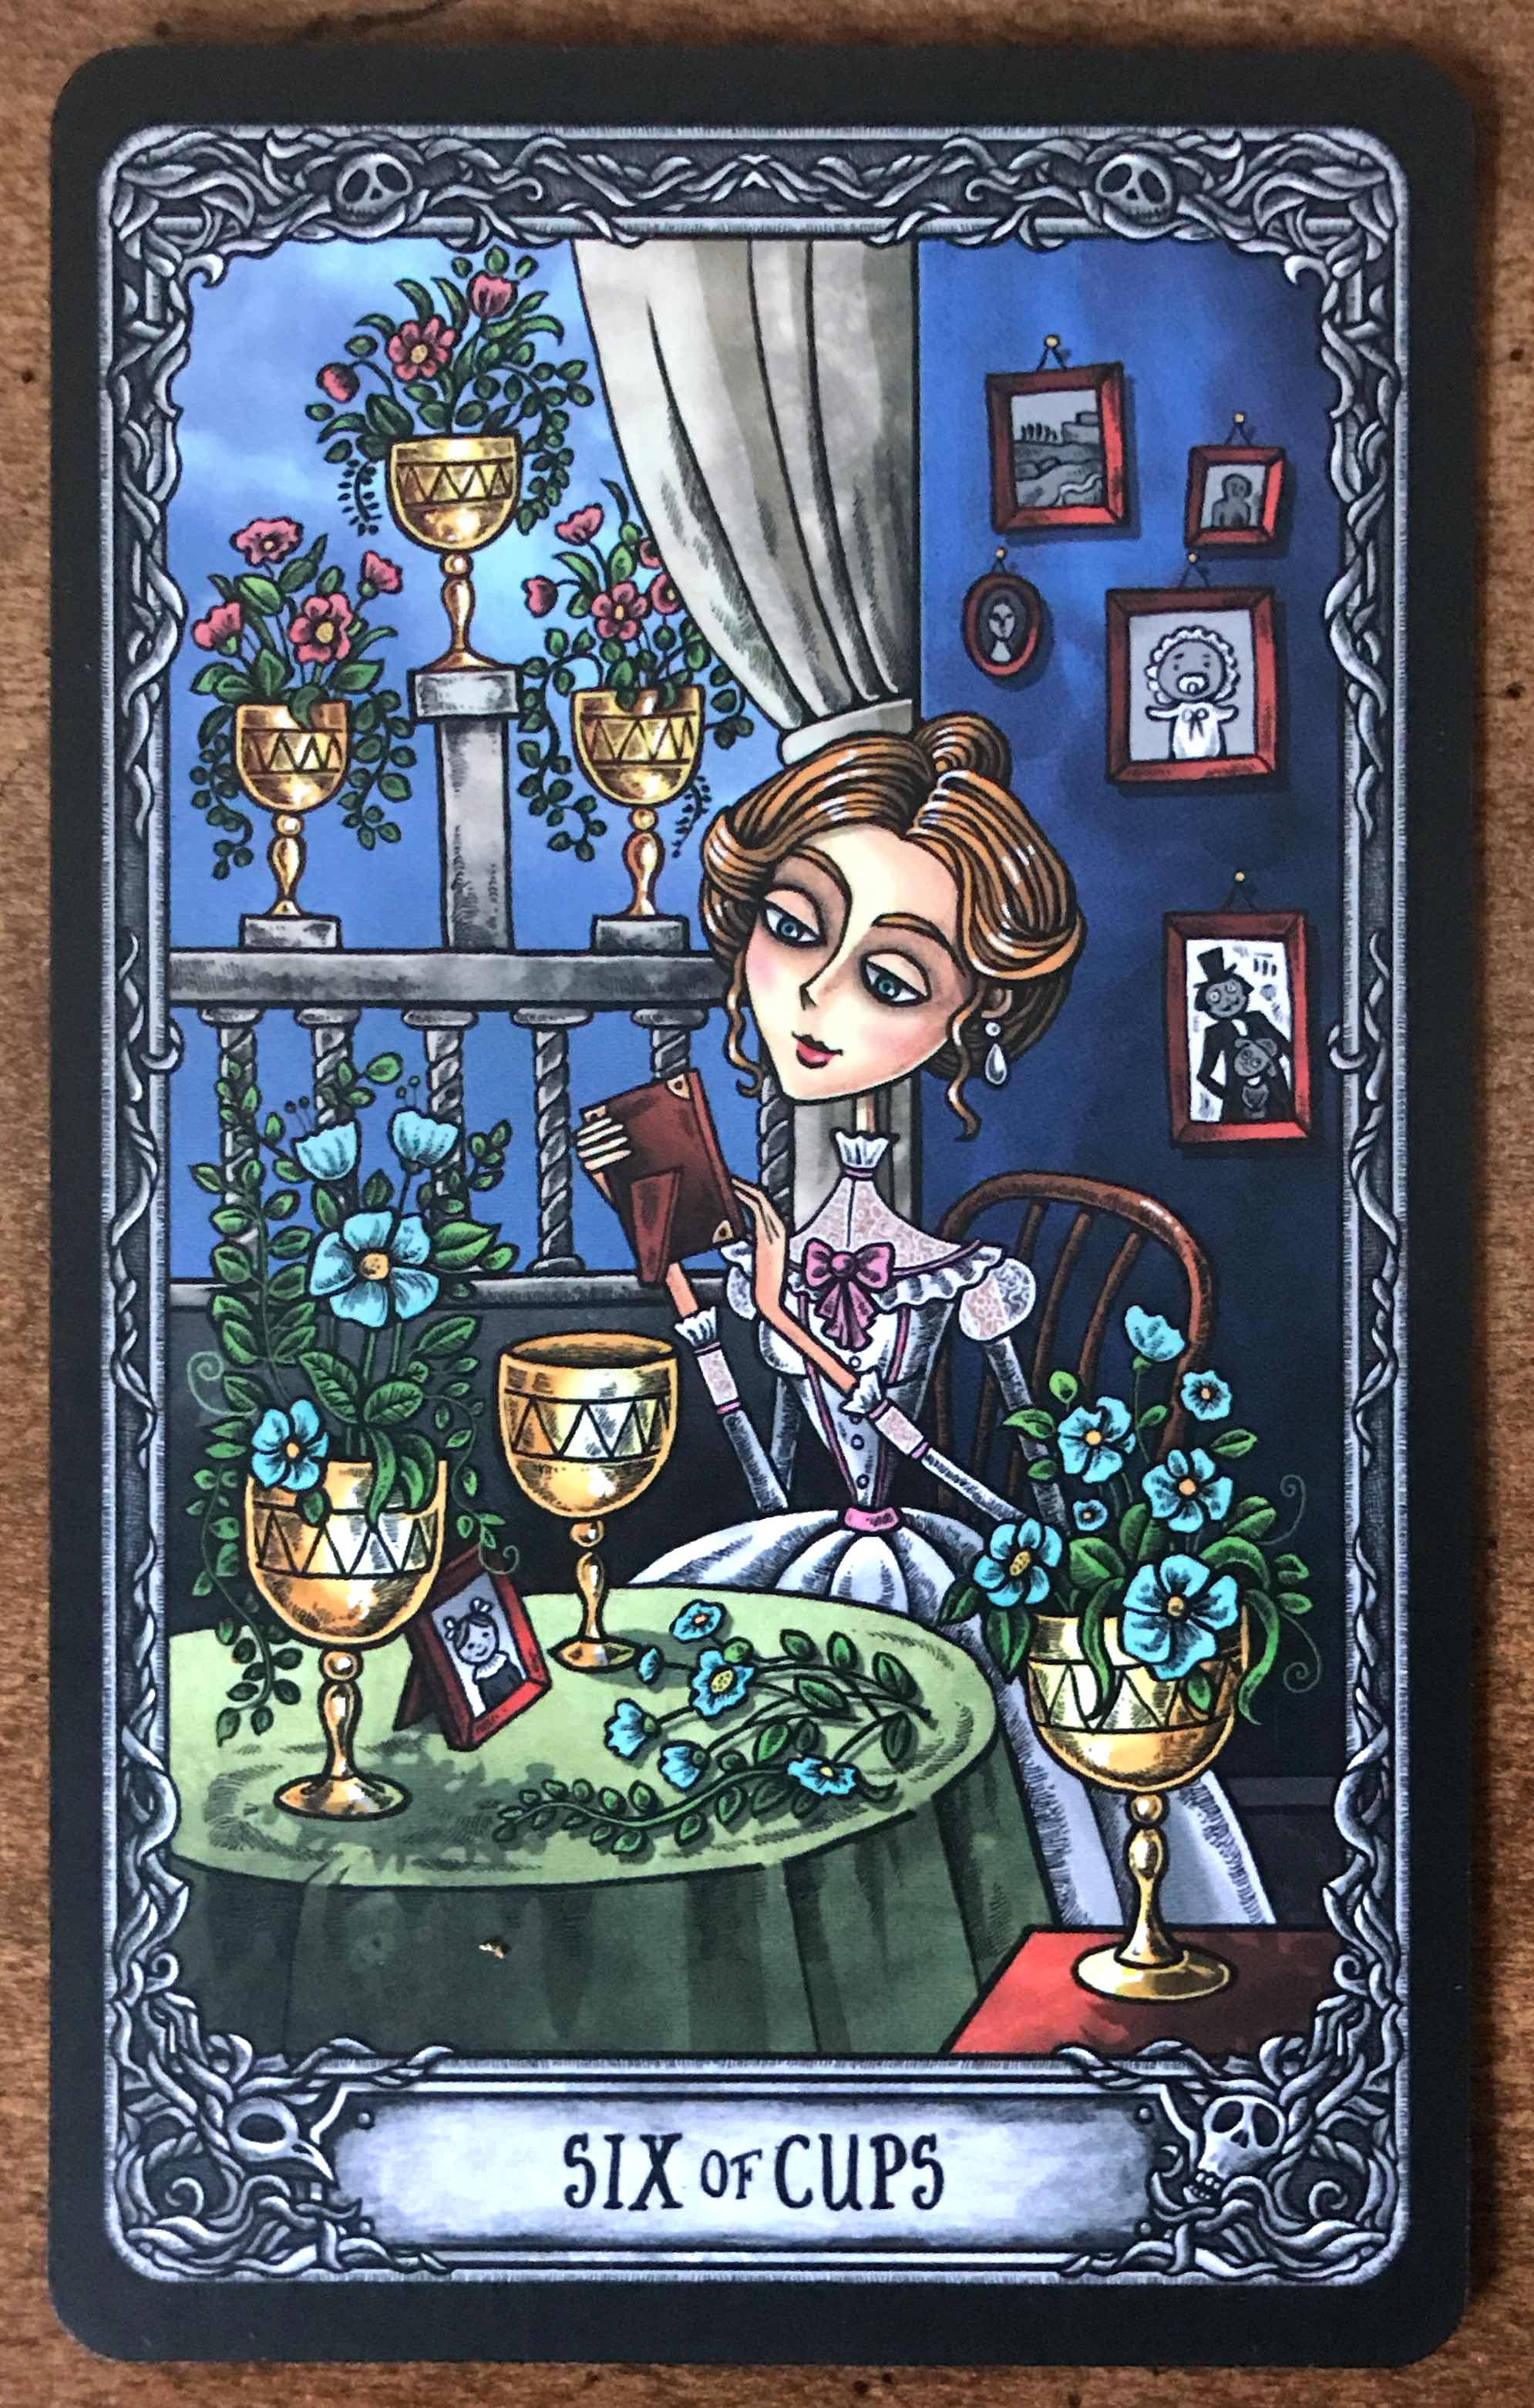 Six of Cups - Dark Mansion Tarot